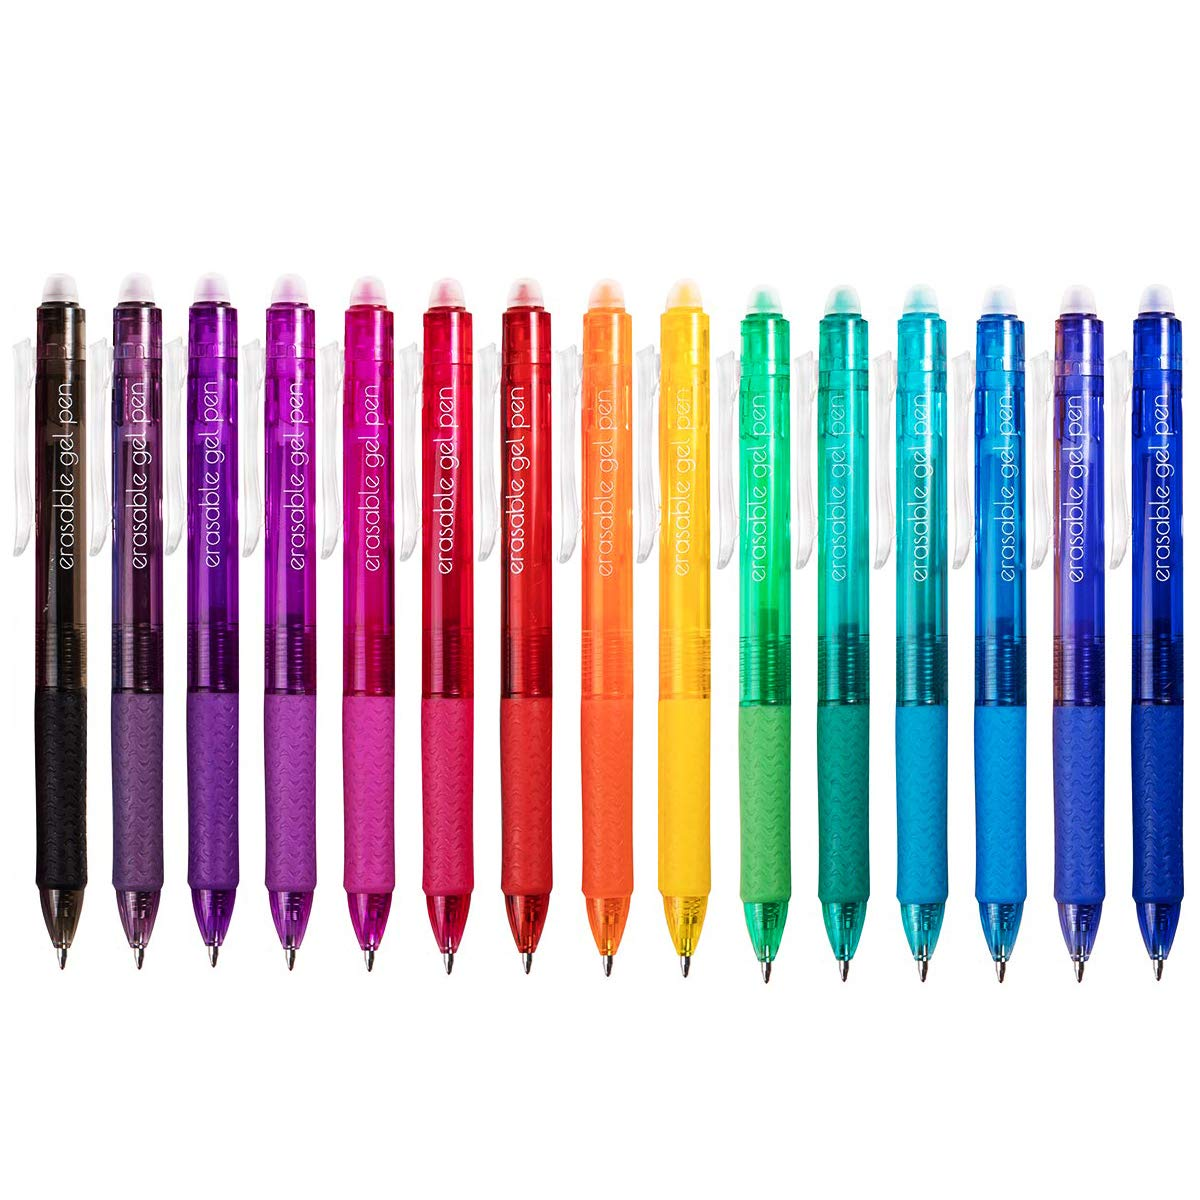 Vanstek 15 Colors Retractable Erasable Gel Pens Clicker, Fine Point(0.7), Make Mistakes Disappear, Premium Comfort Grip for Drawing Writing Planner and Crossword Puzzles by Vanstek